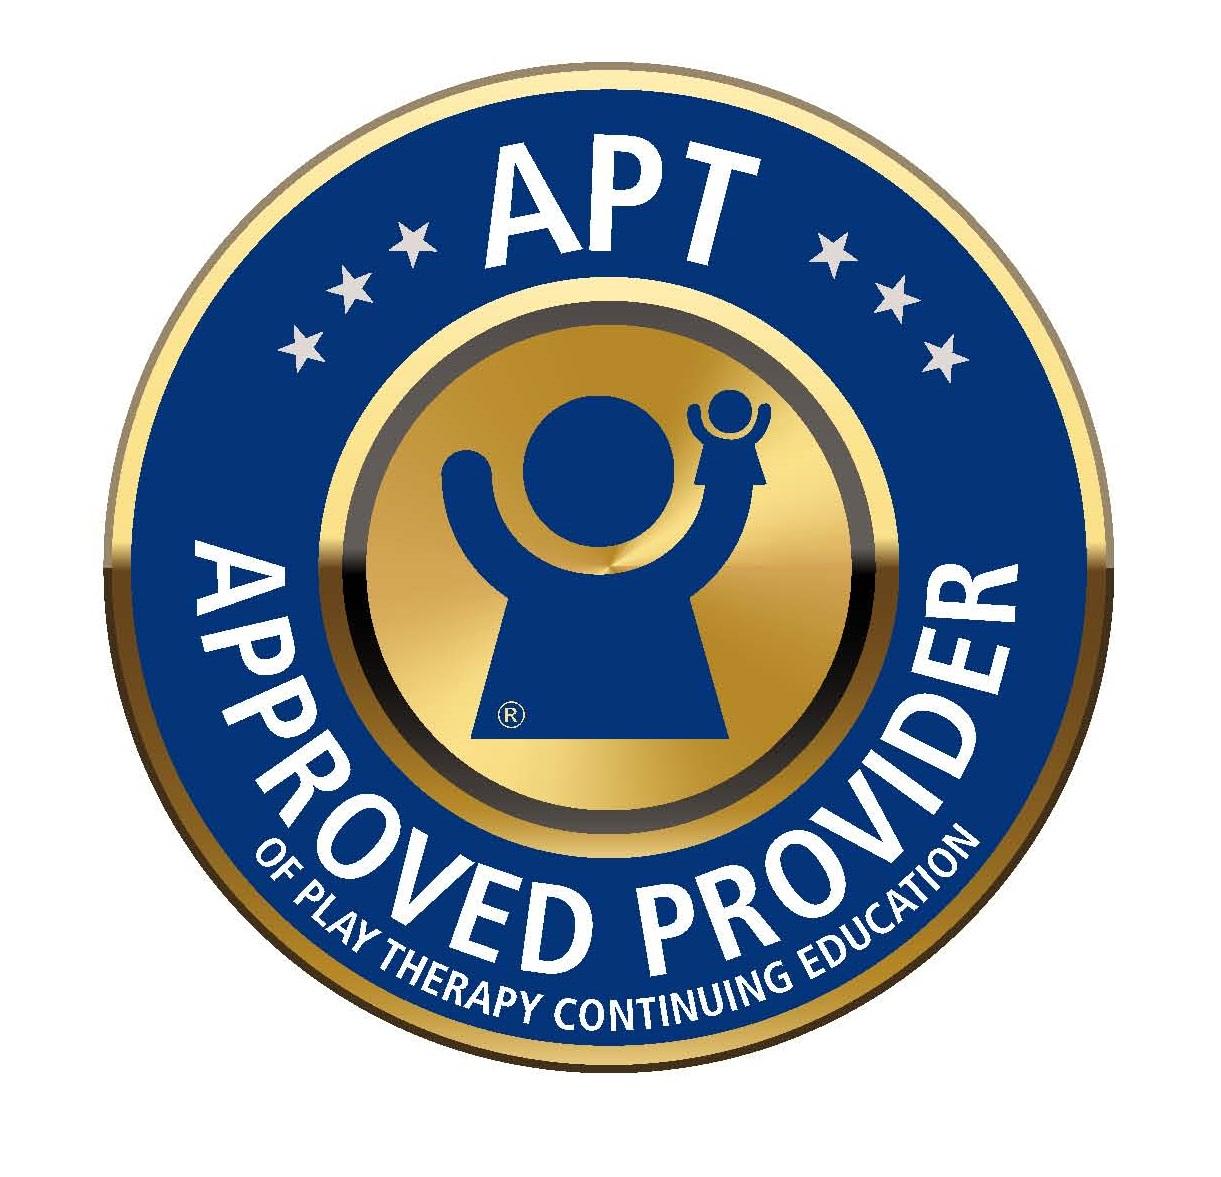 APT Approved Provider Logo - Feb 2016